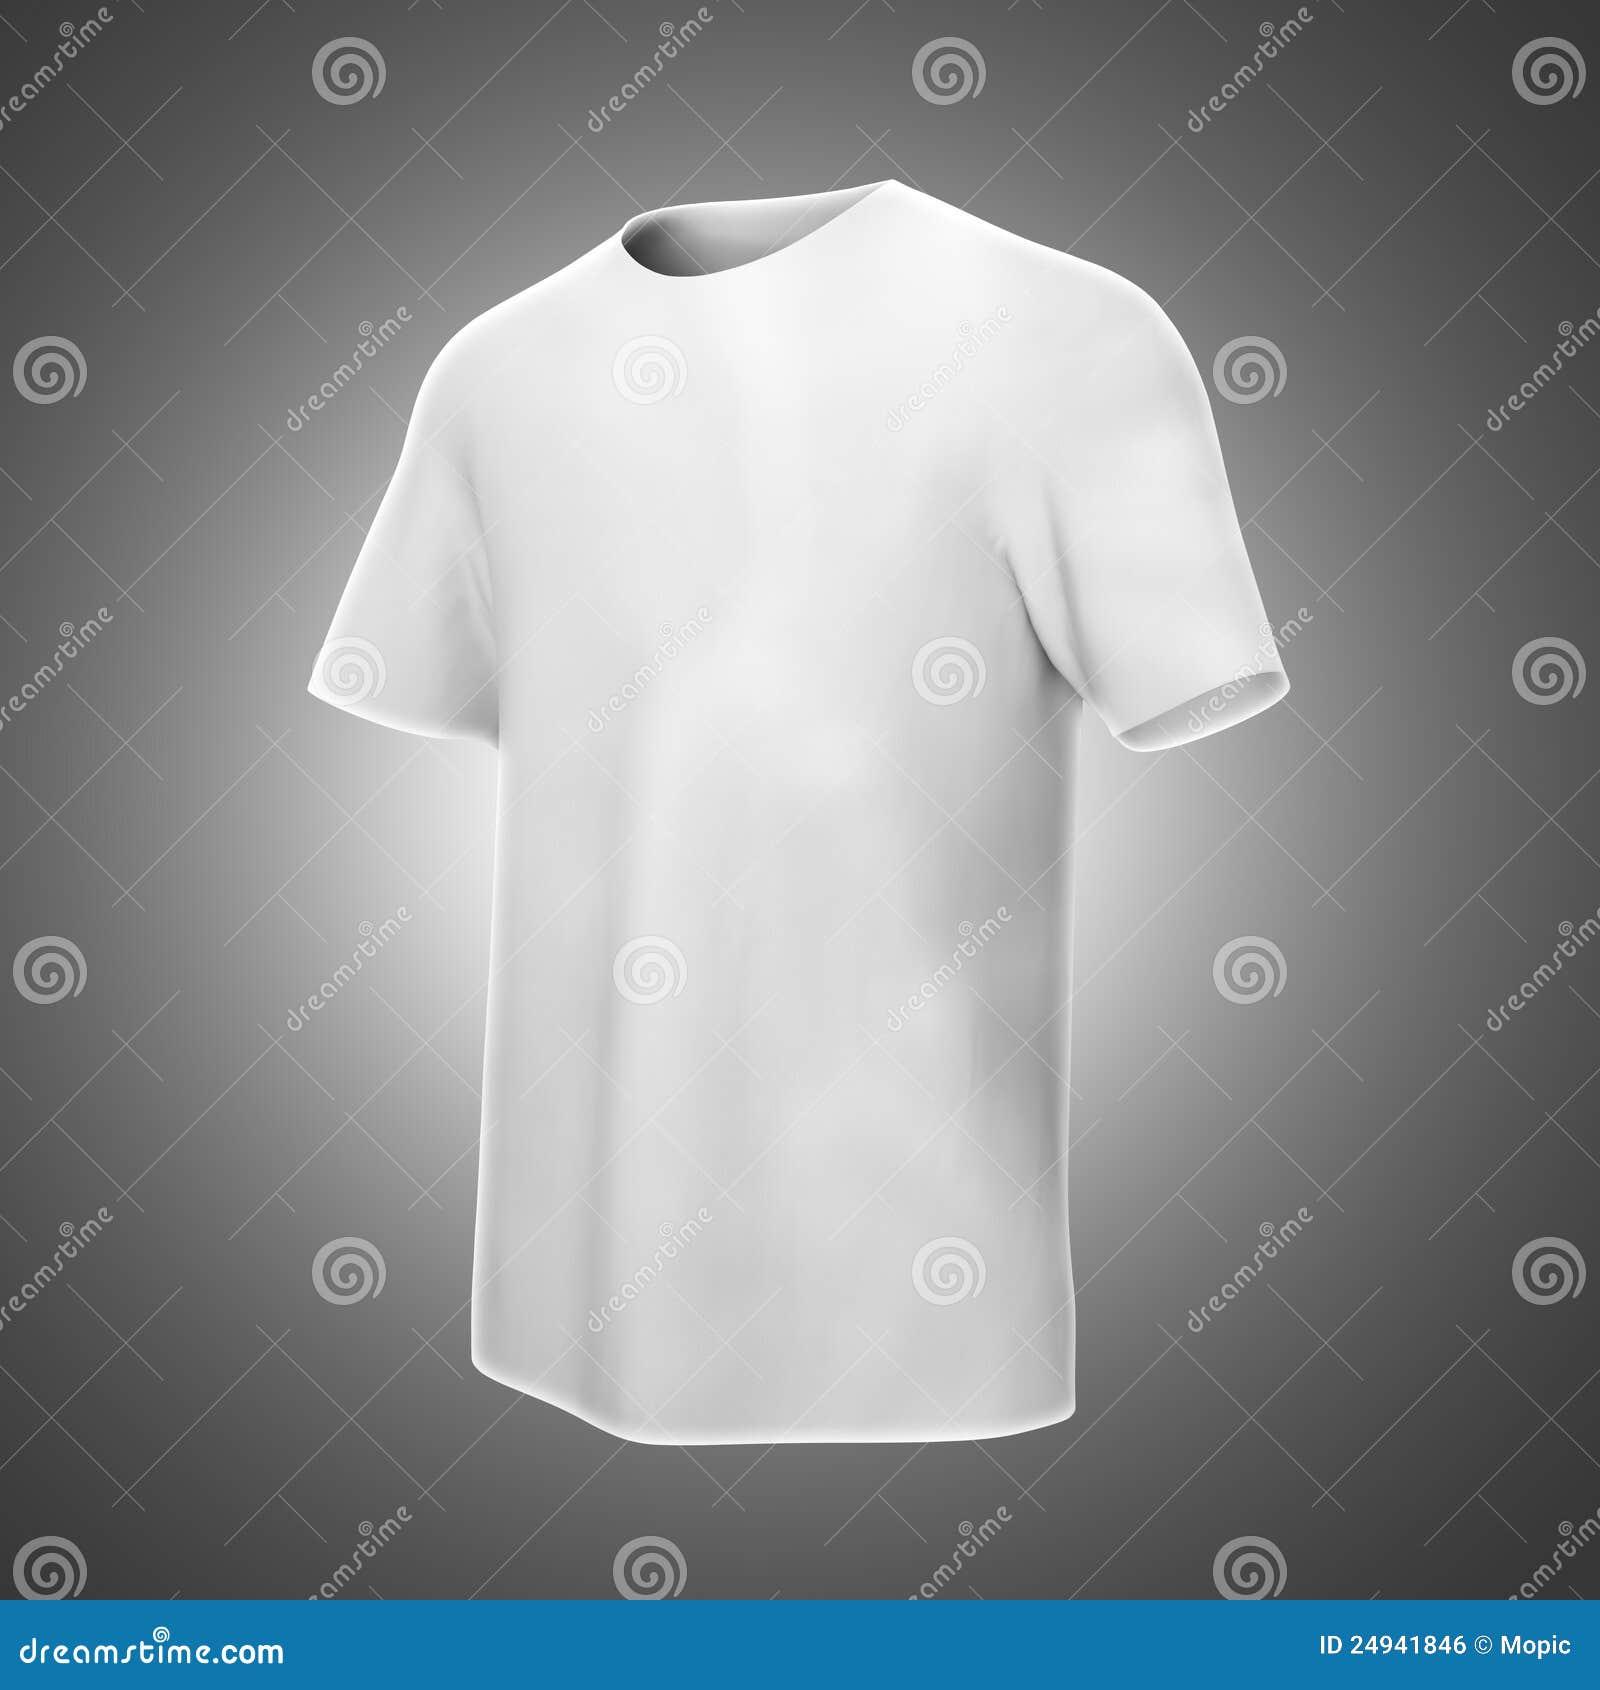 White Color Shirt Design